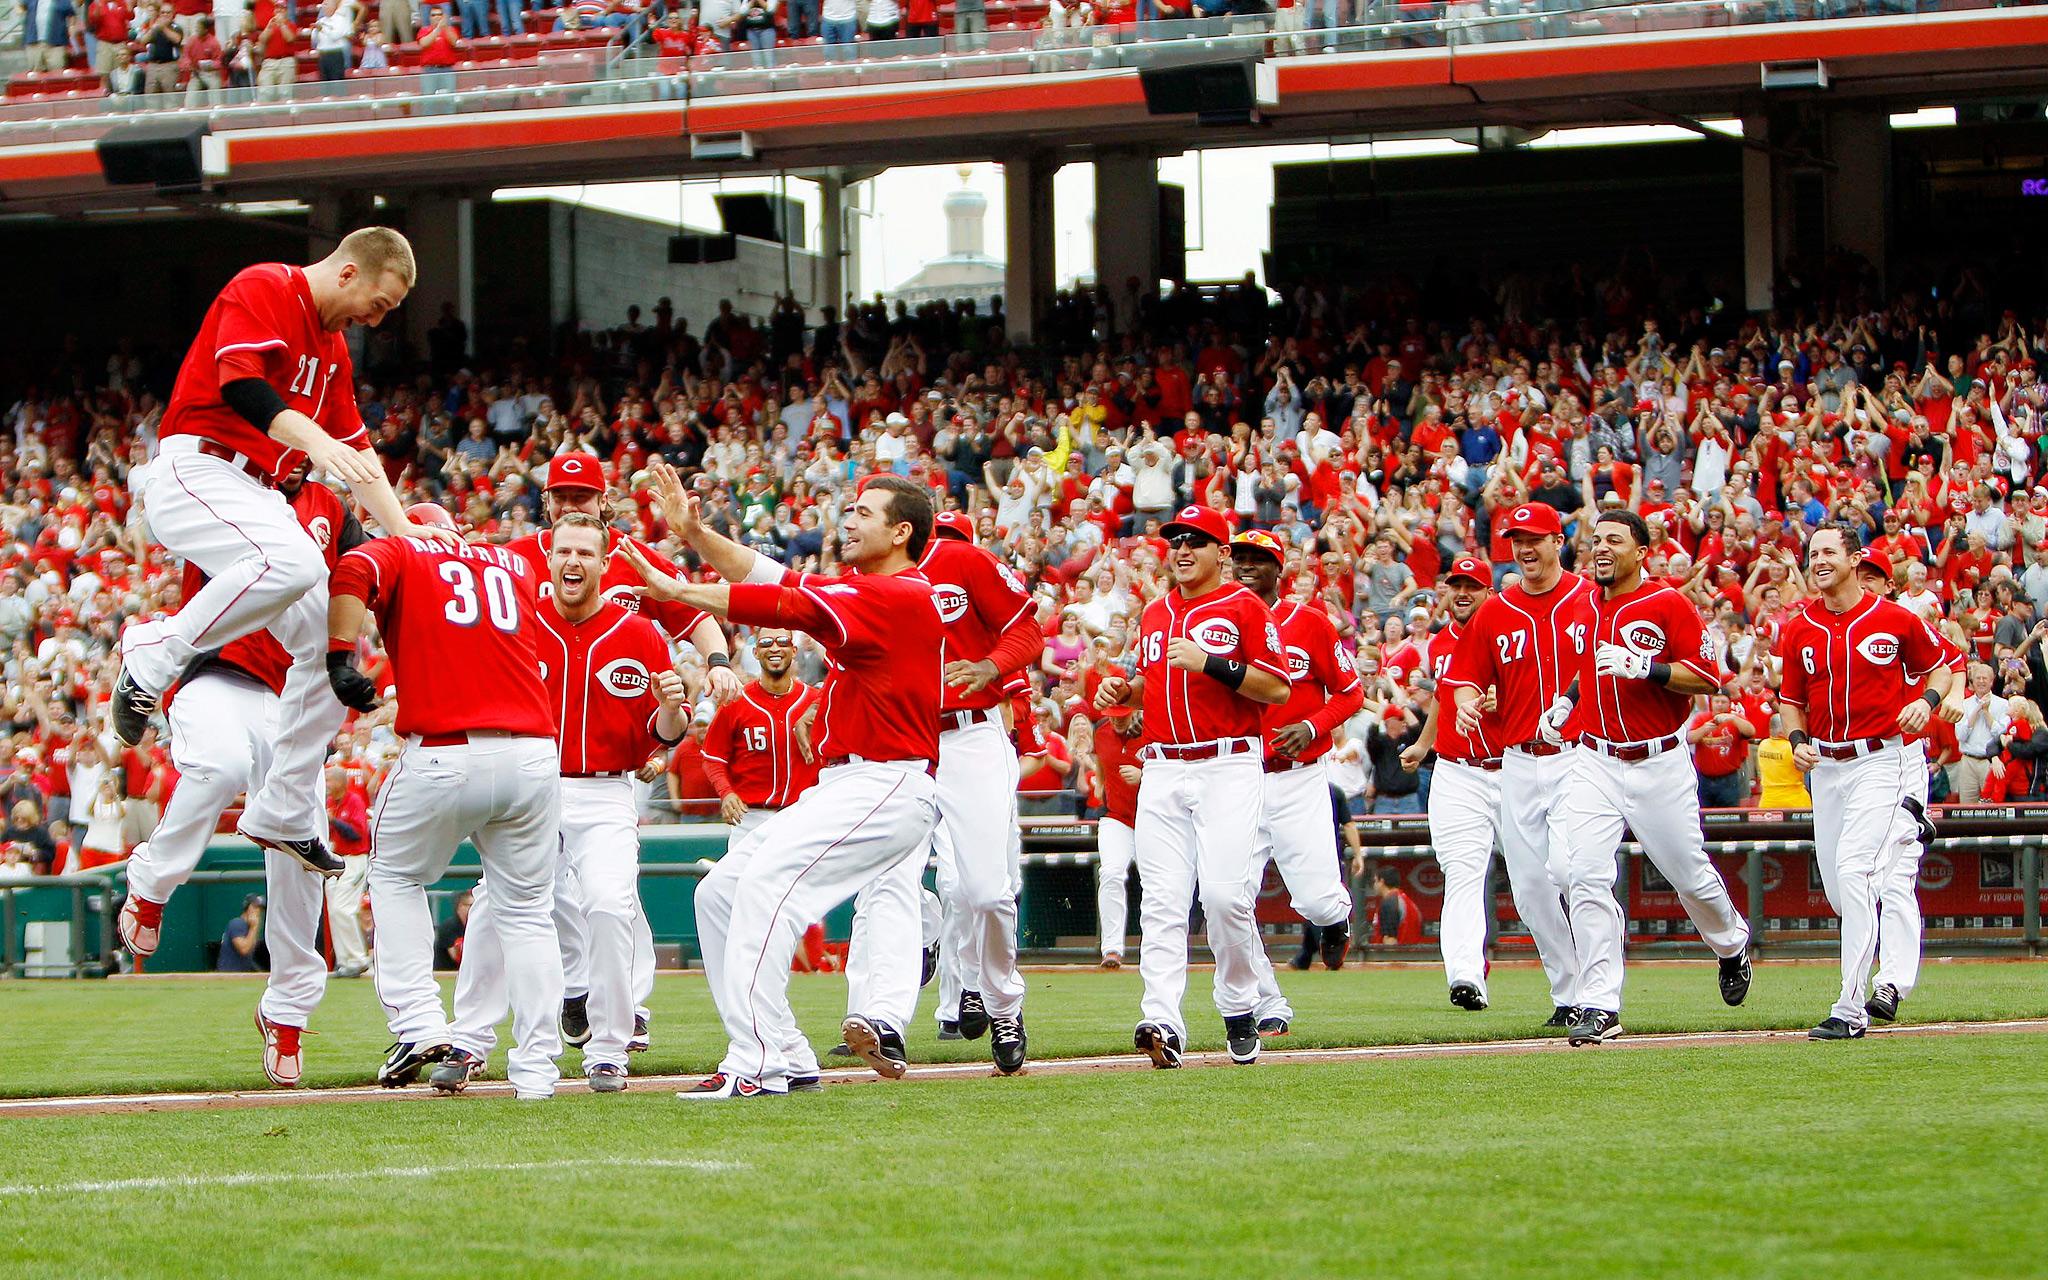 Cincinnati Reds celebrate